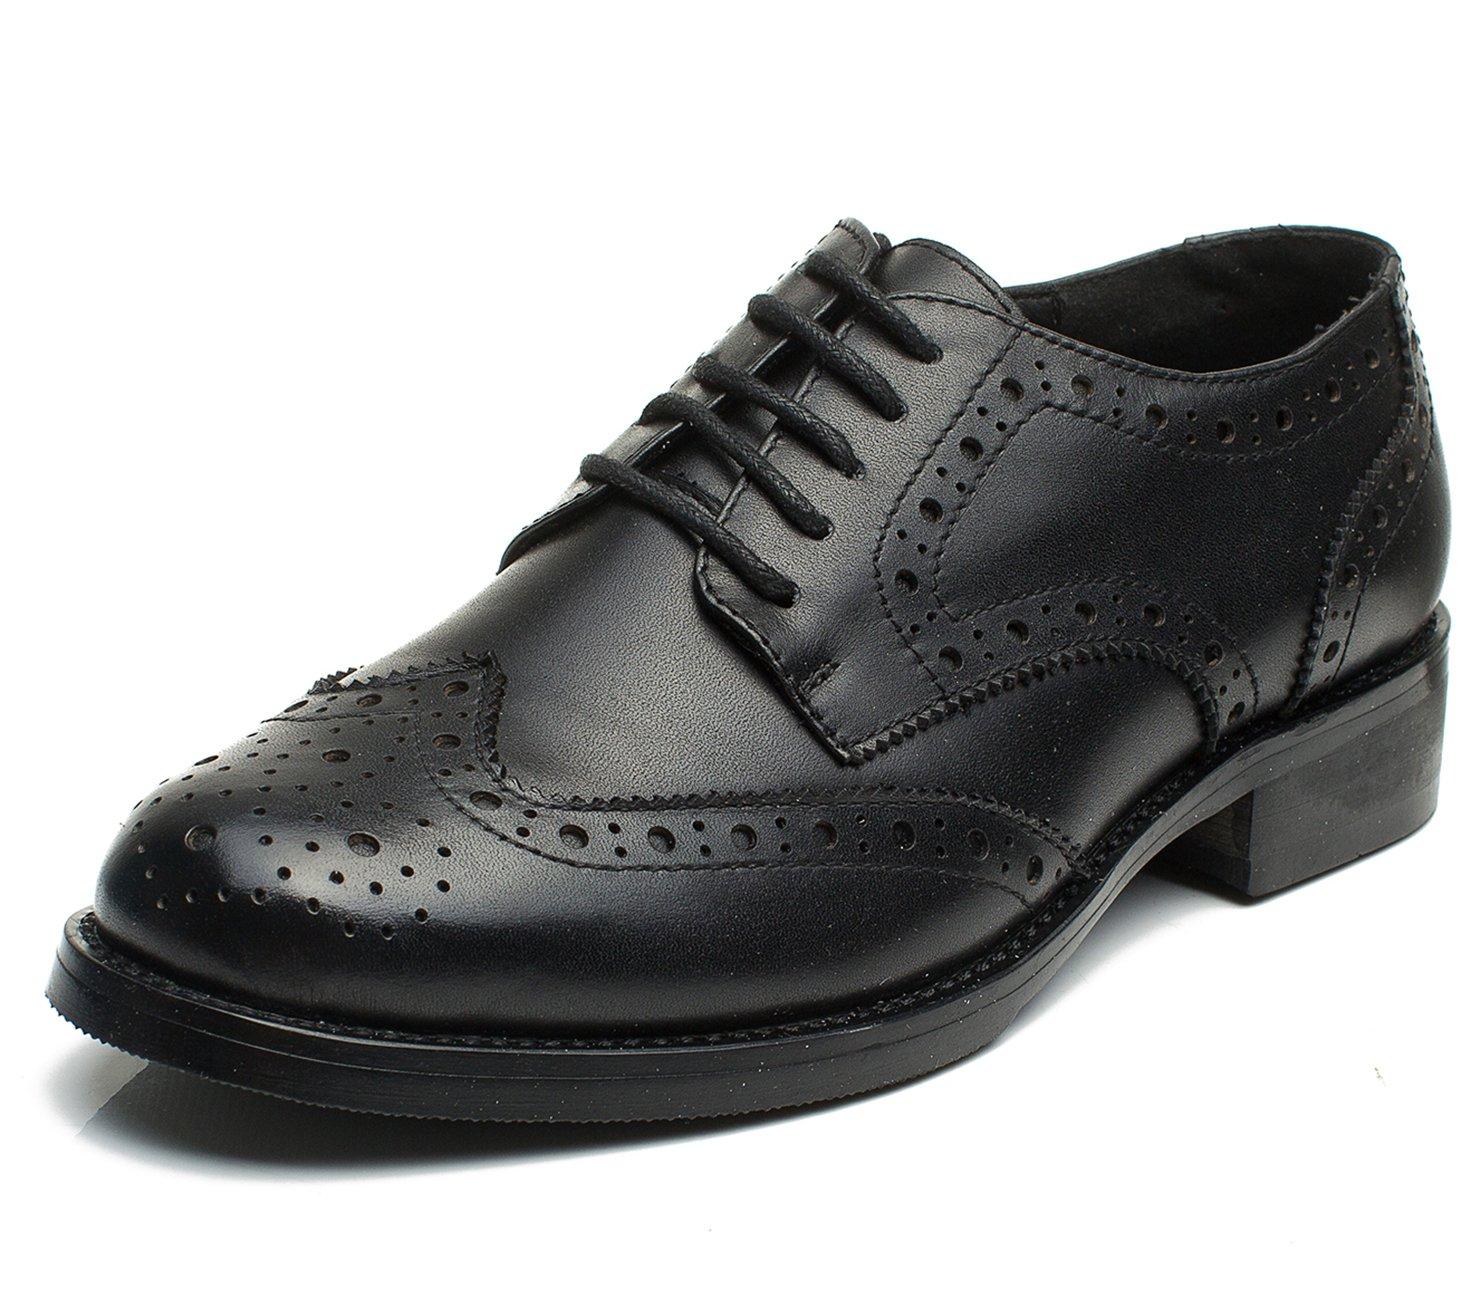 U-lite Black Women Brogues Lace-up Wingtip Leather Flat Oxfords Vintage Oxford Shoe Blk 8.5